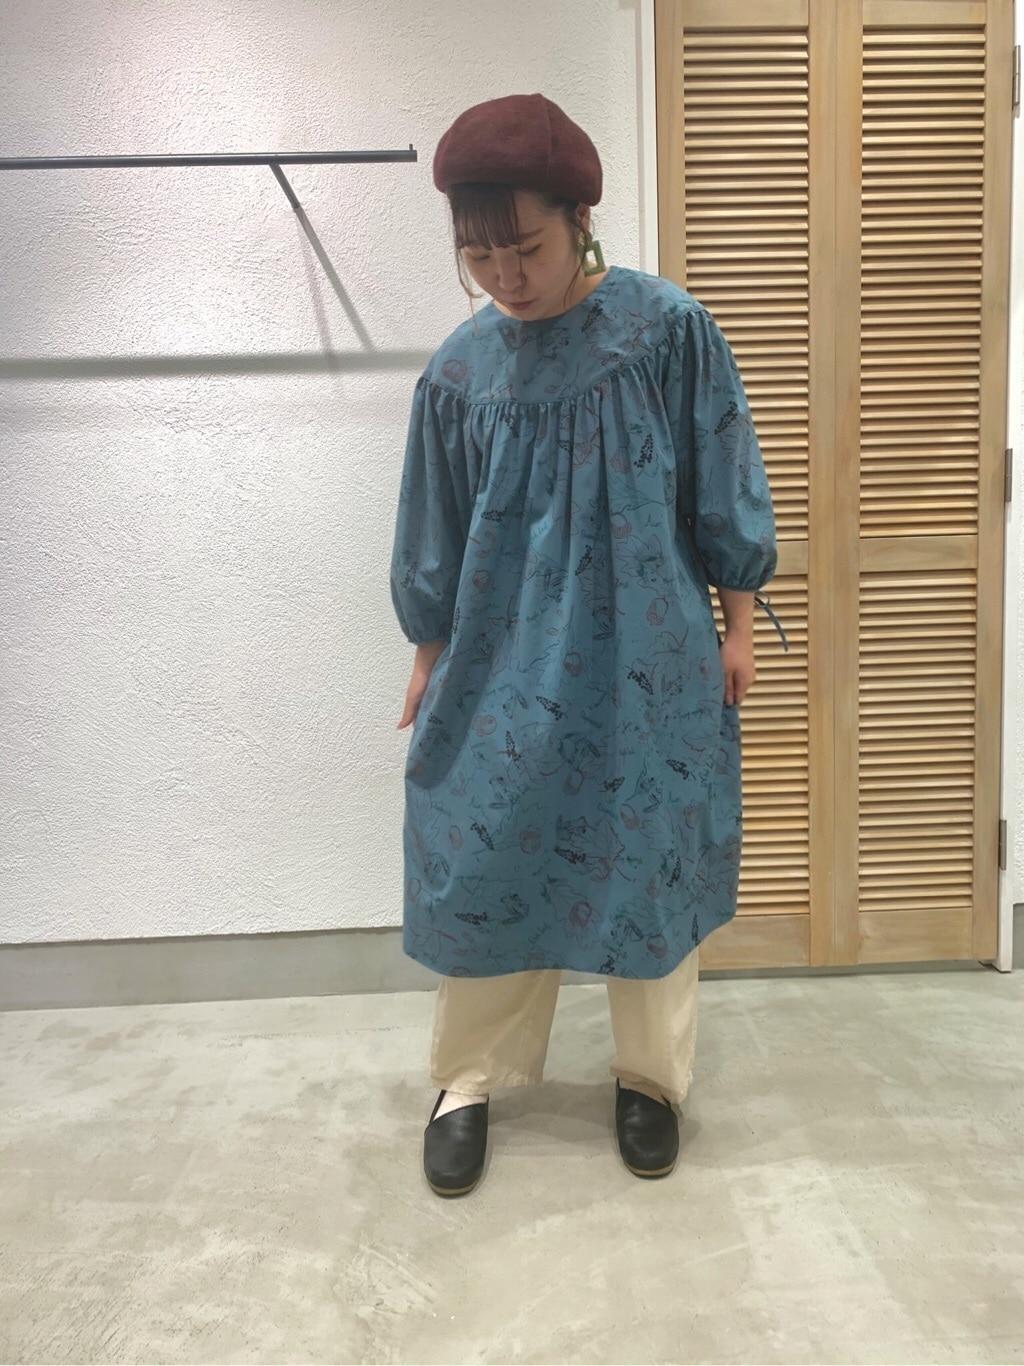 chambre de charme 横浜ジョイナス 身長:155cm 2020.08.27